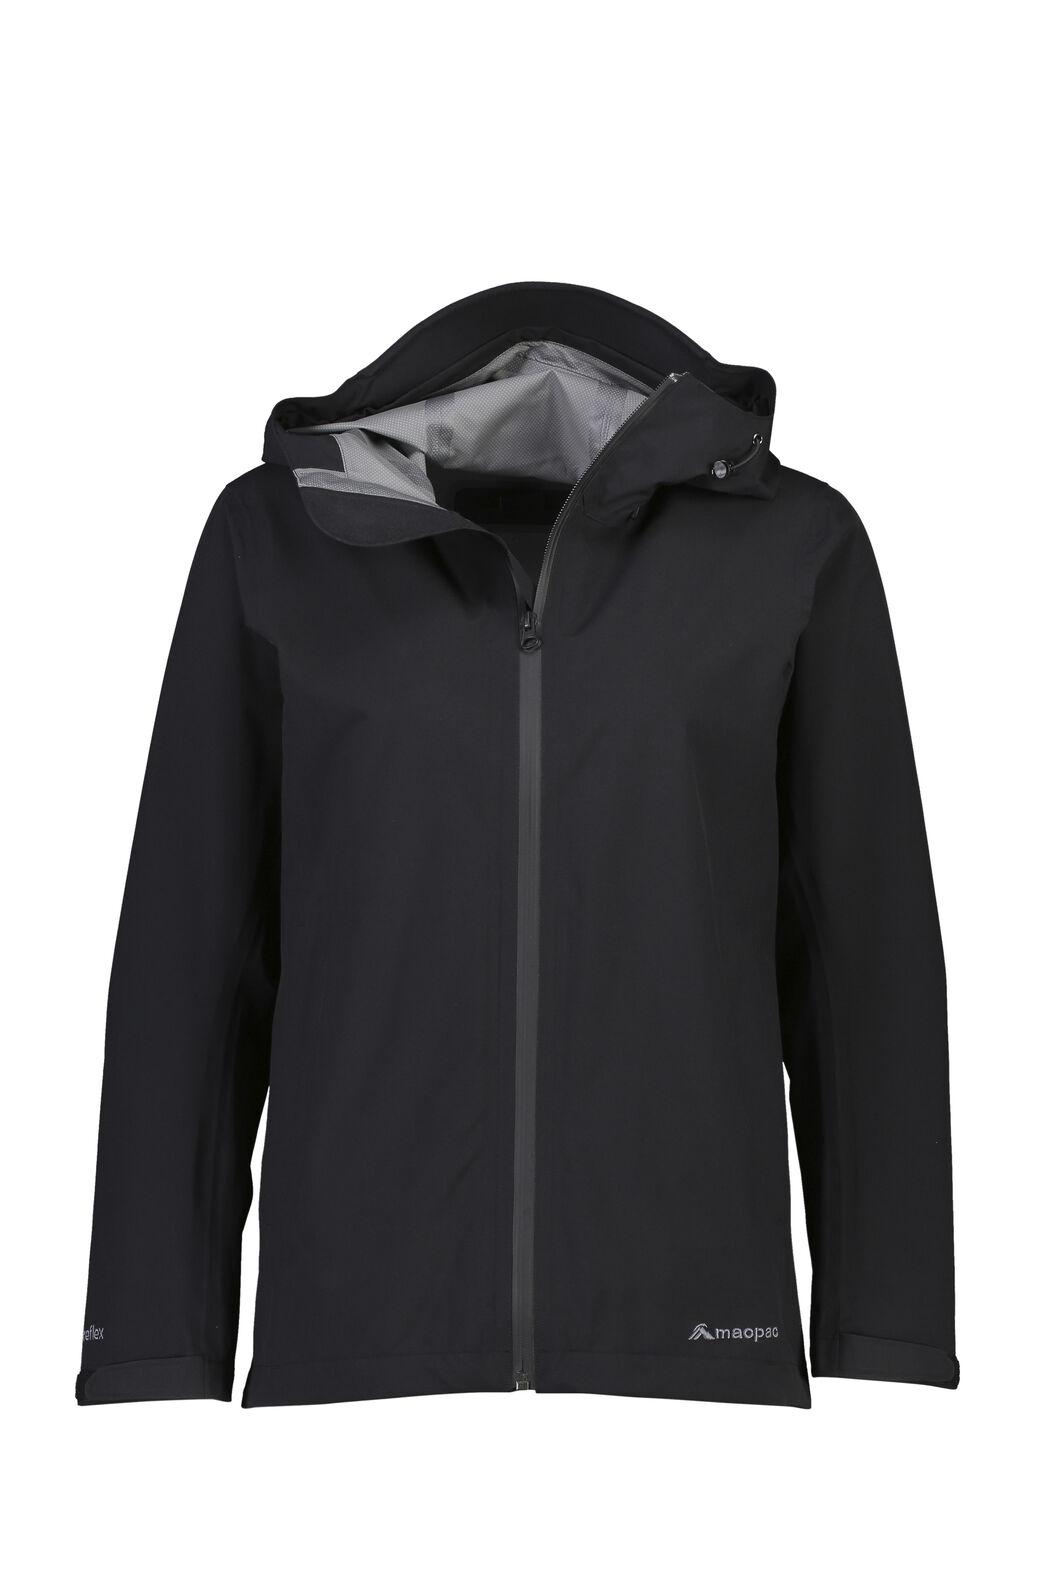 Macpac Dispatch Rain Jacket — Women's, Black, hi-res